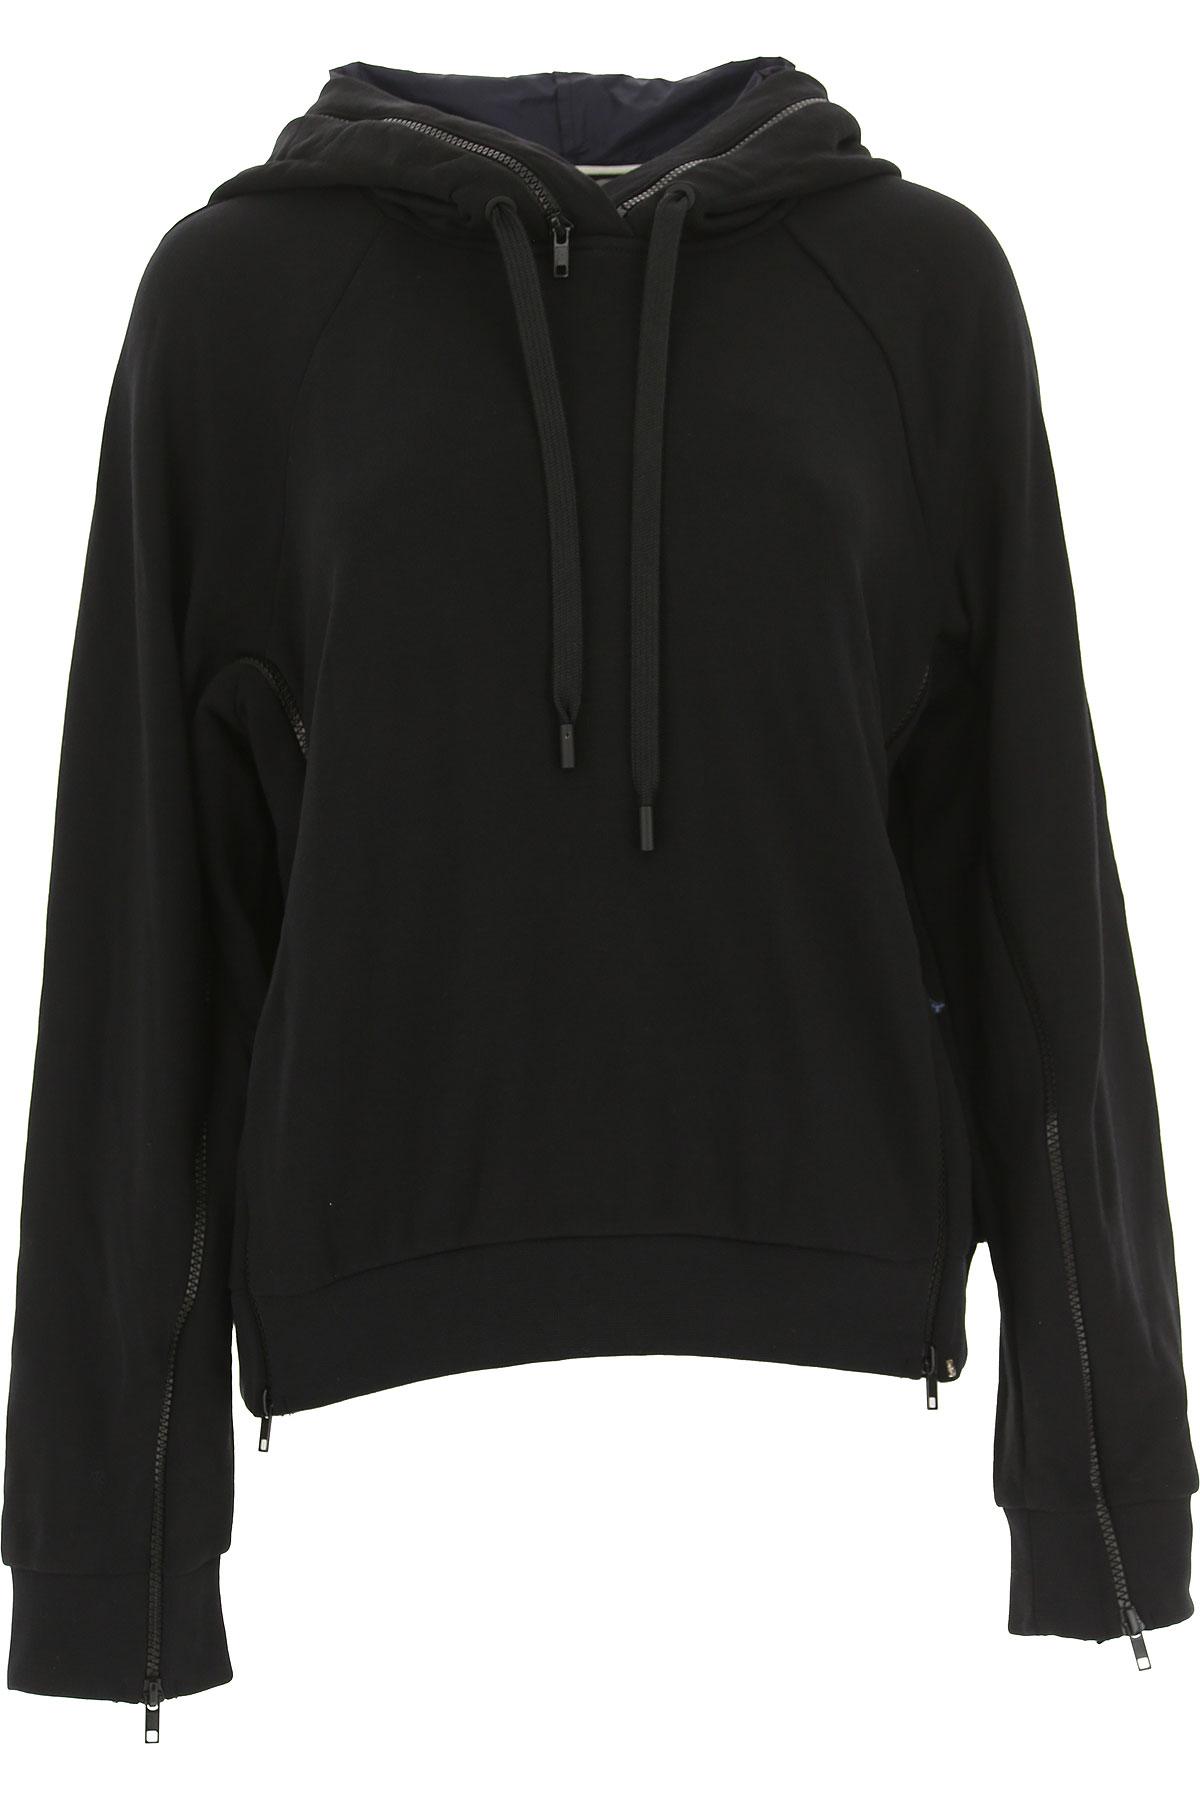 Image of SportMax Sweatshirt for Women, Black, Cotton, 2017, 4 6 8